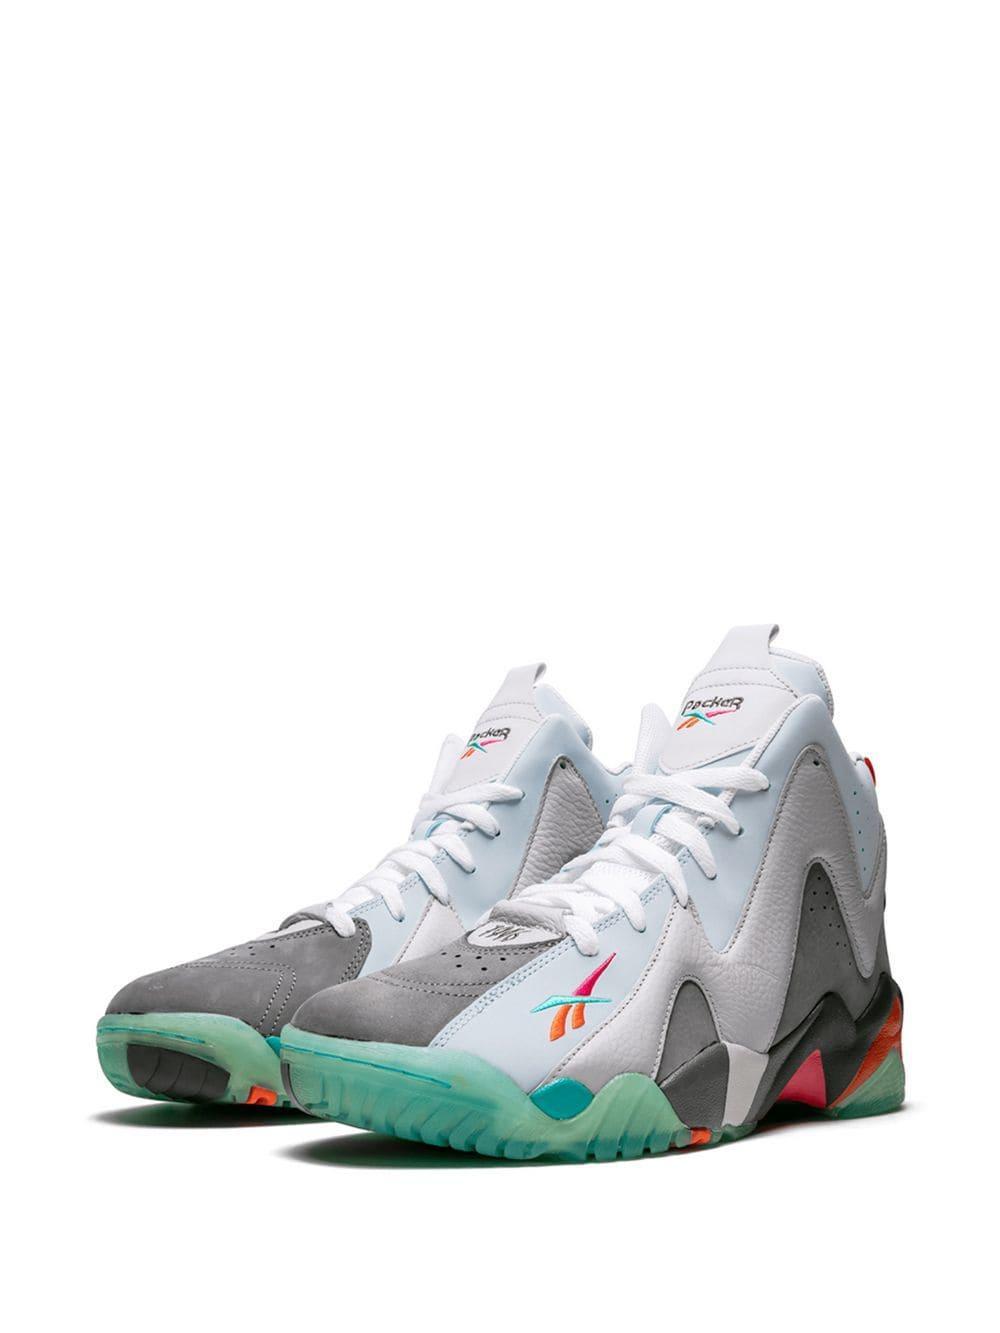 99c56ebaca12 Lyst - Reebok Kamikaze 2 Mid Sneakers in Gray for Men - Save 12%